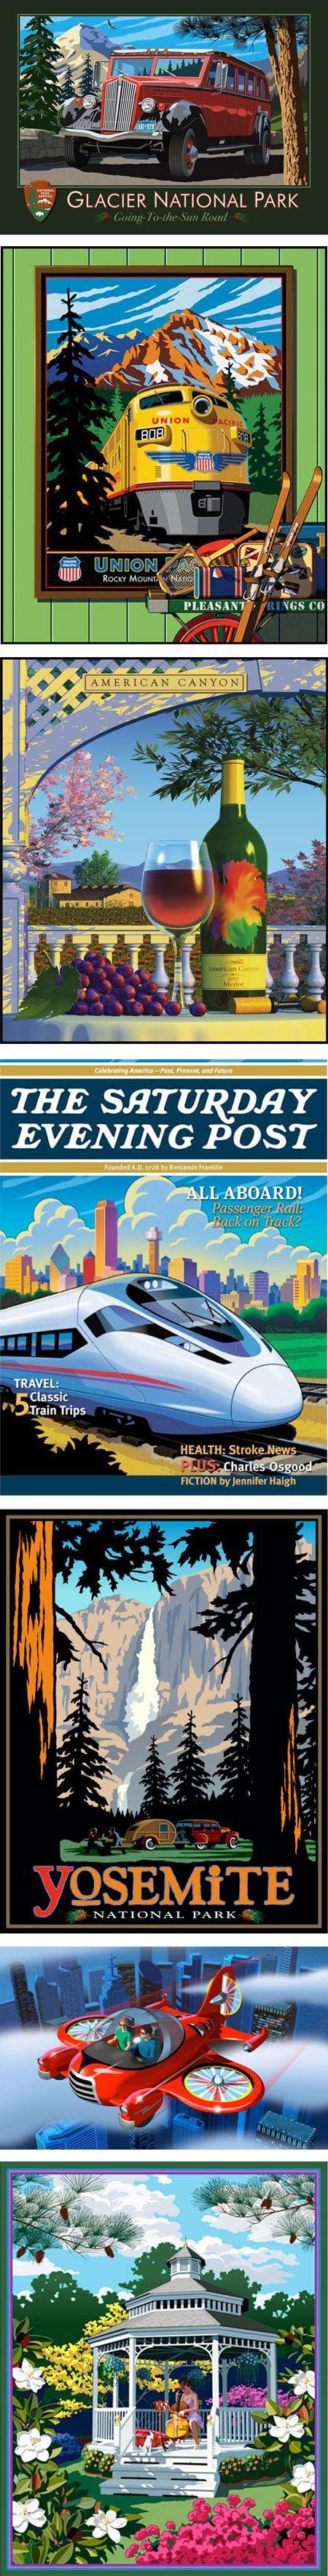 Glenn Gustafson retro-style travel posters